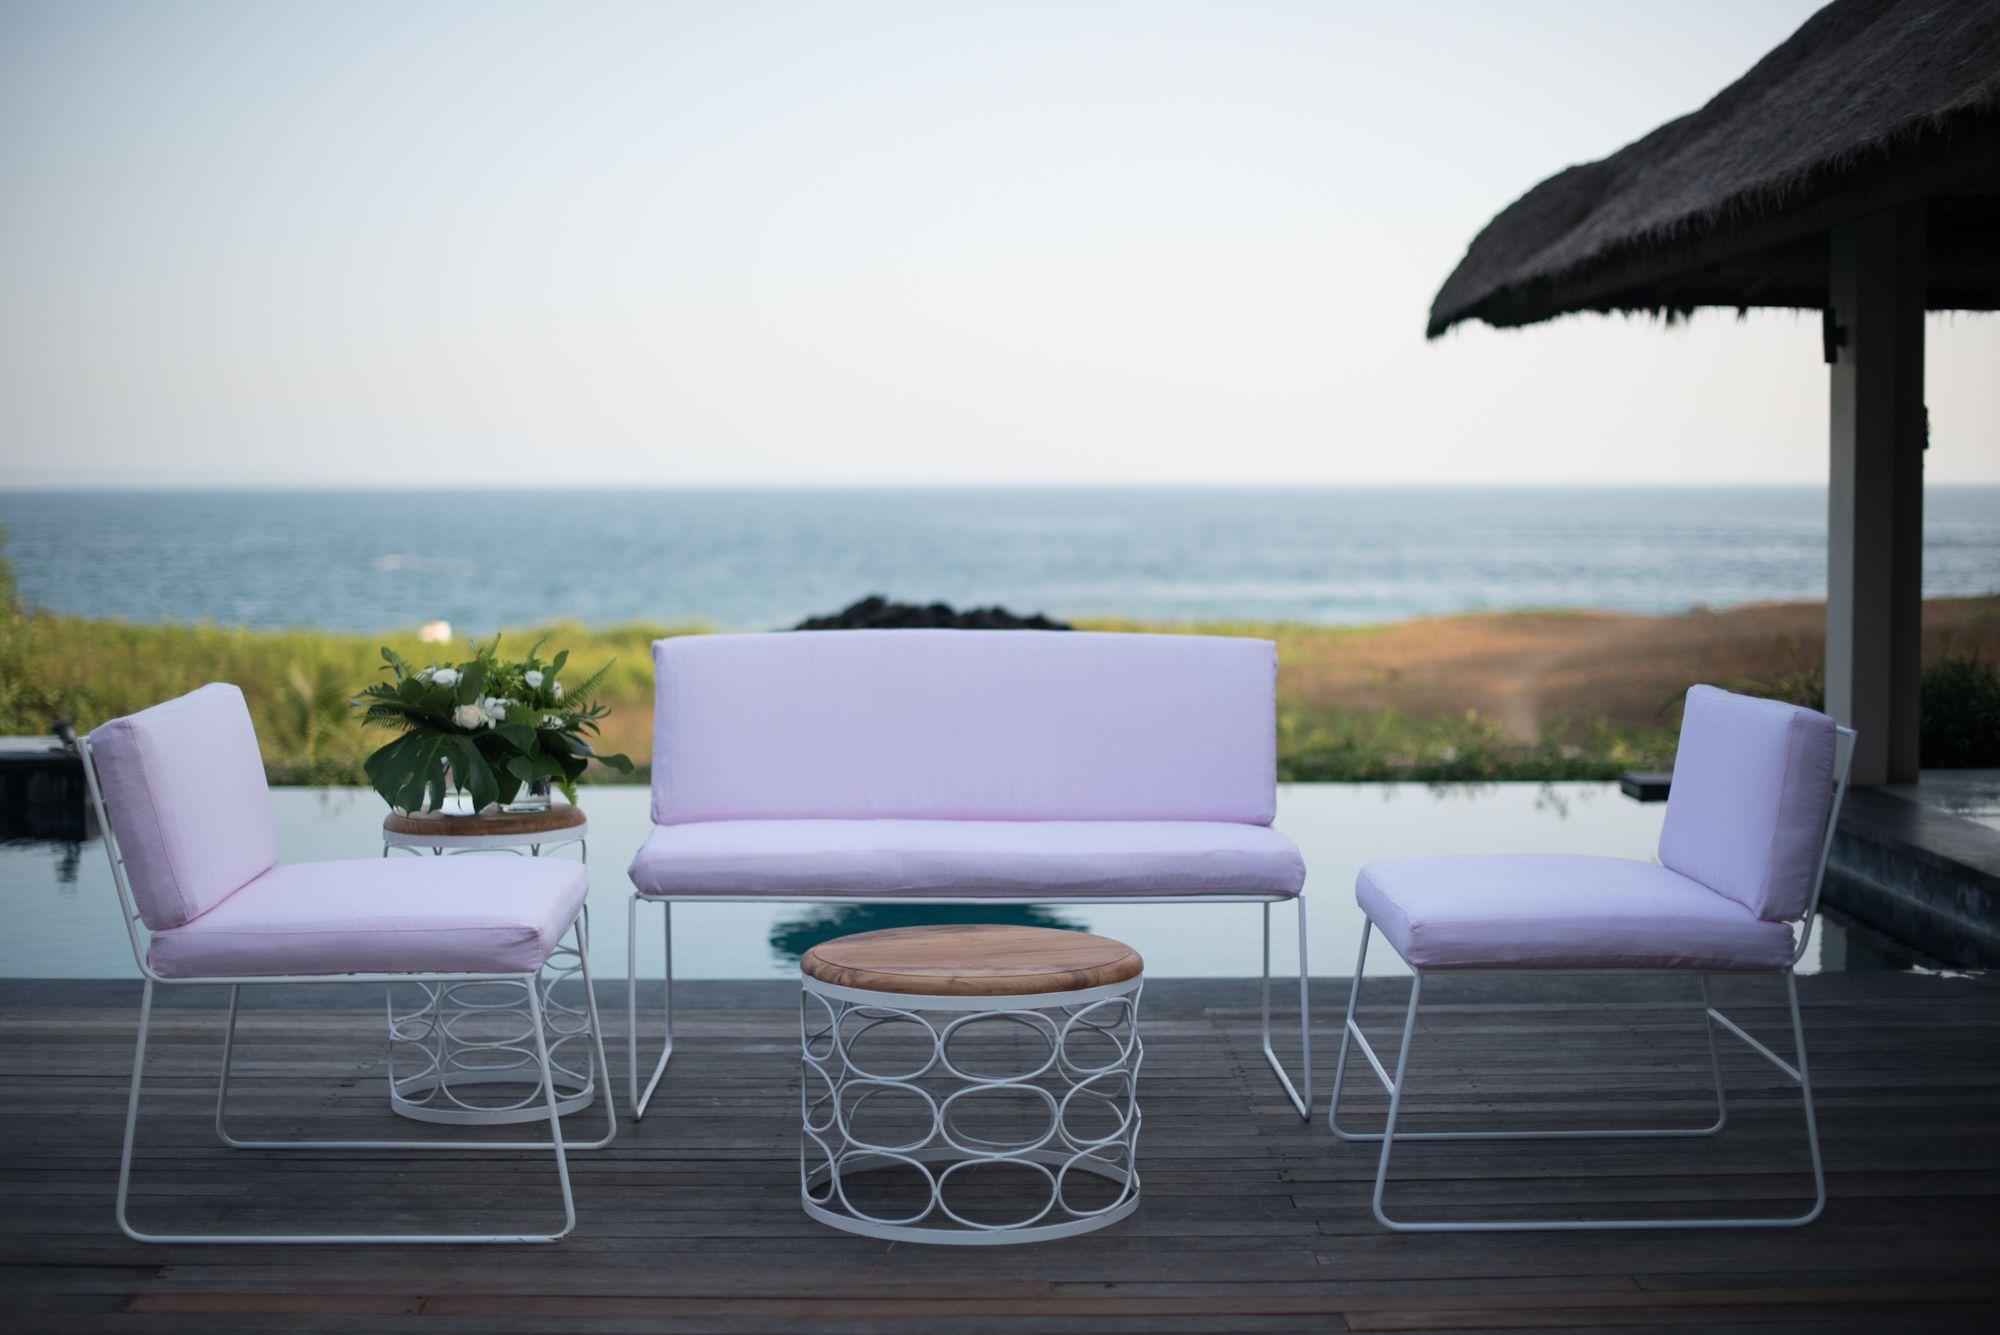 Home Rental Furniture Wedding Furniture Rental Outdoor